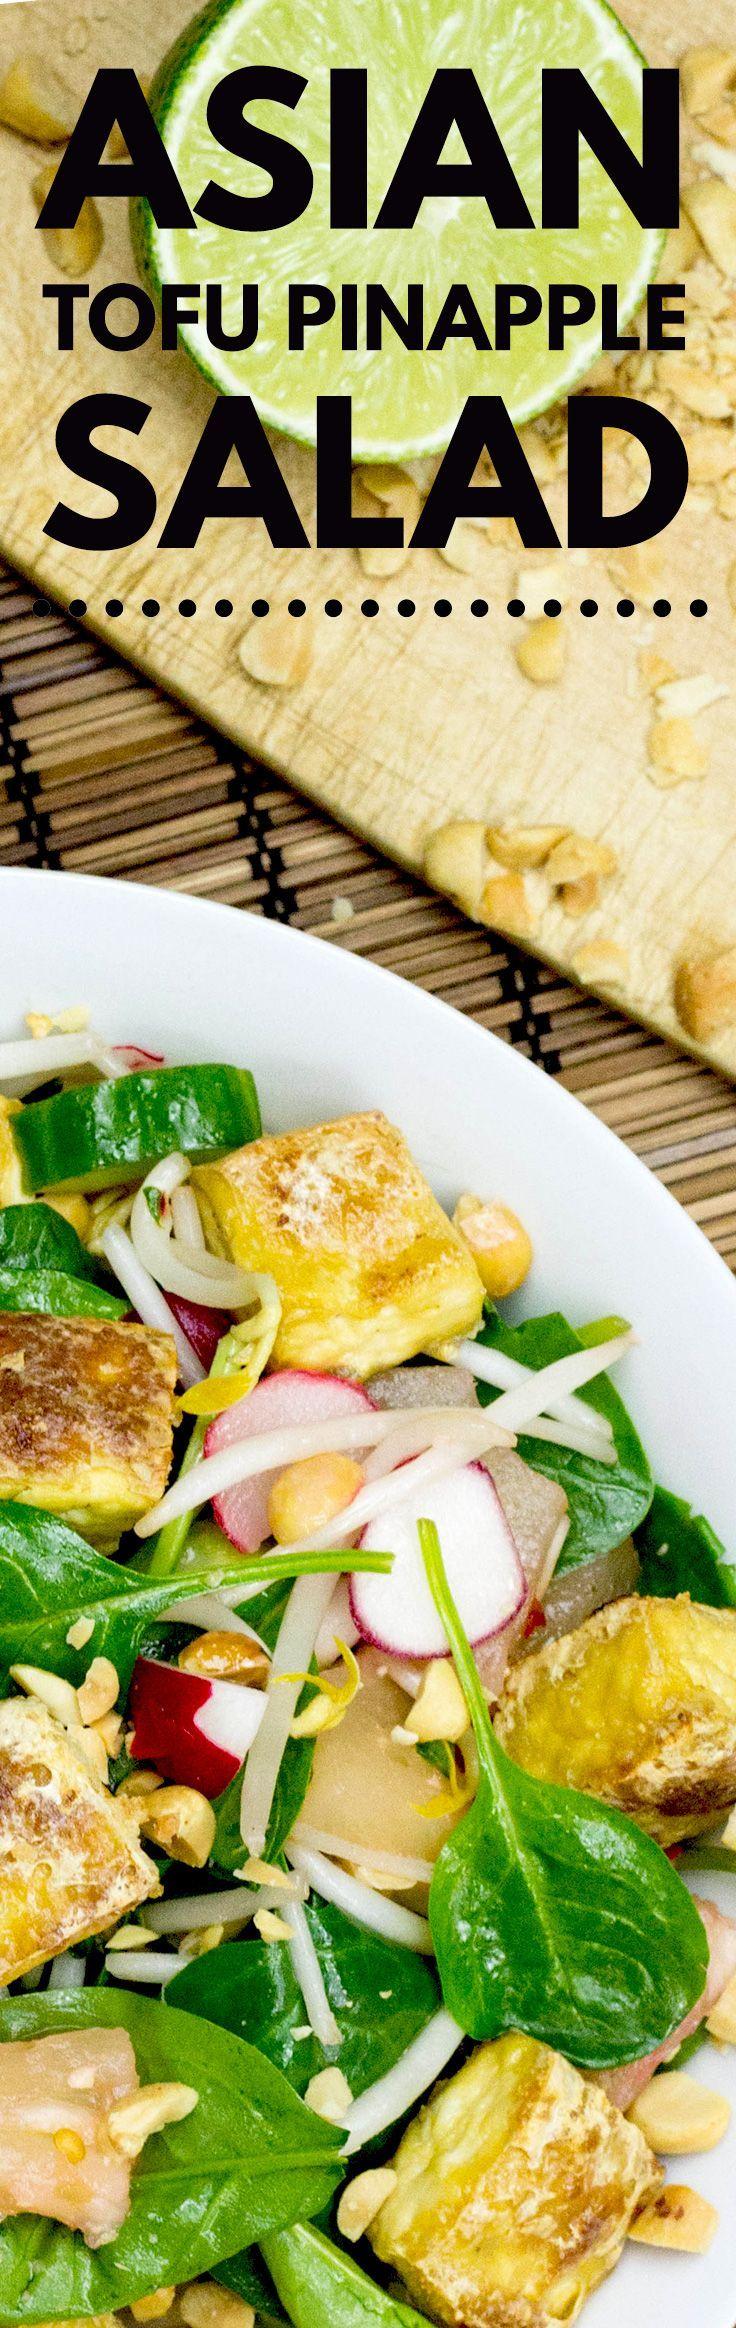 Crispy Tofu Salad, High in Protein, Low-carb and Vegan | http://hurrythefoodup.com